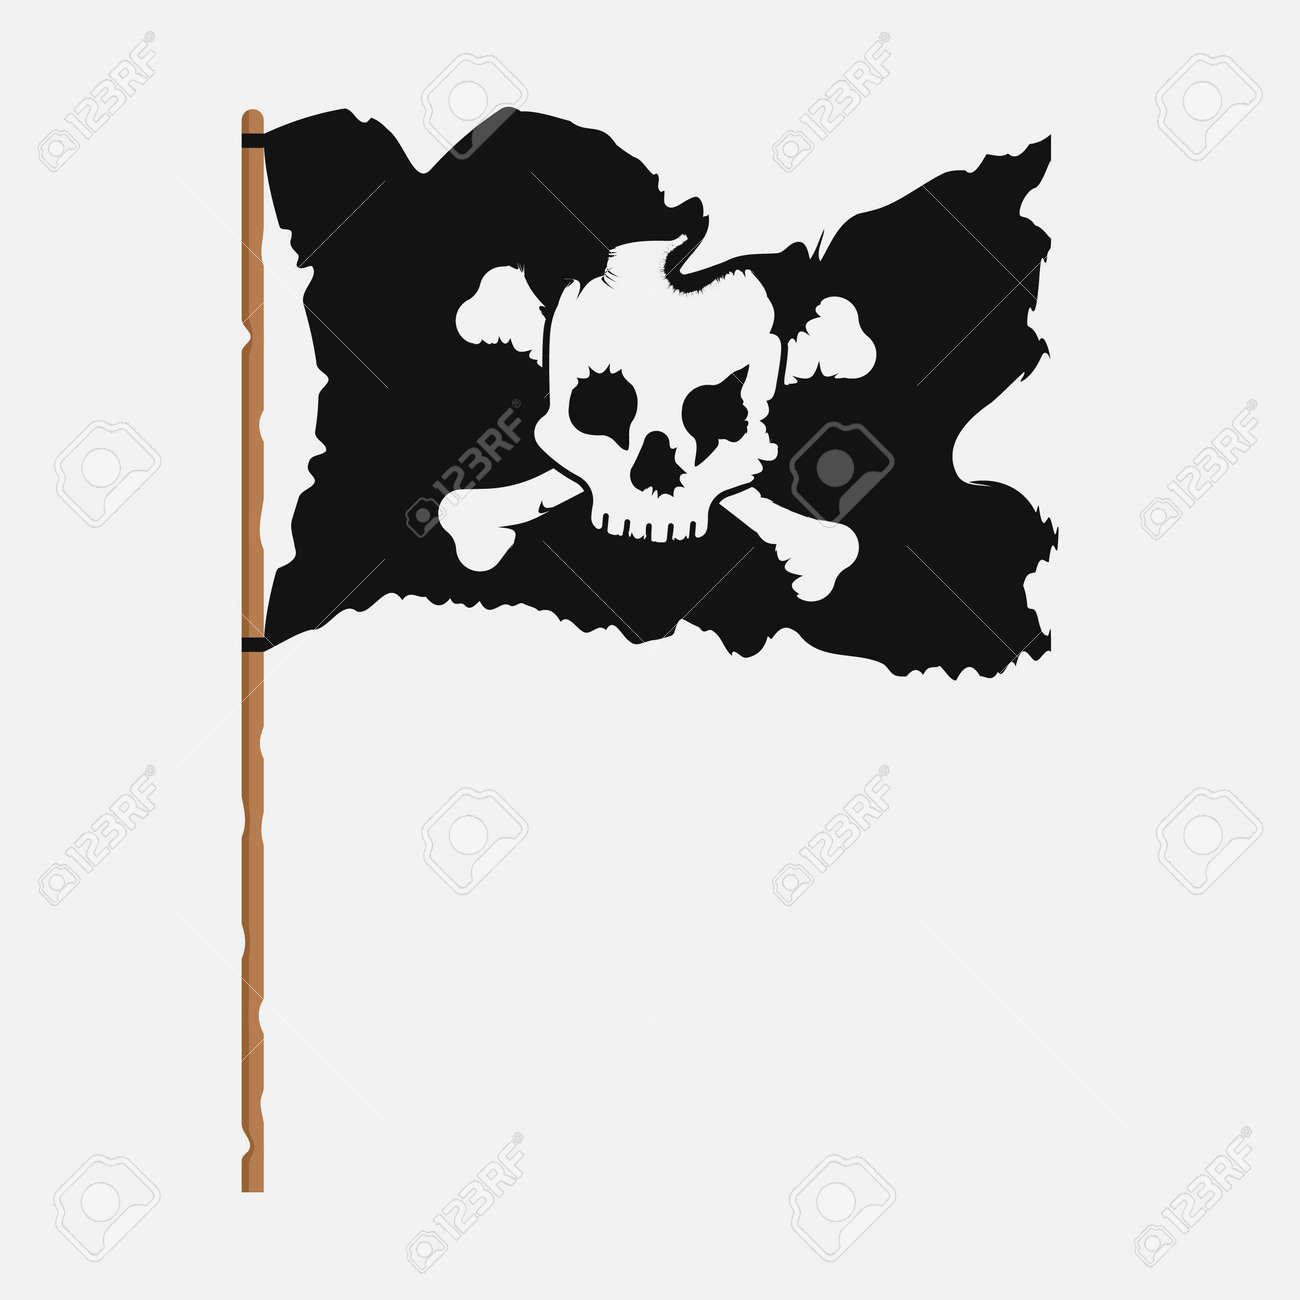 Torn pirate flag with white skull symbol. Vector illustration - 166669117